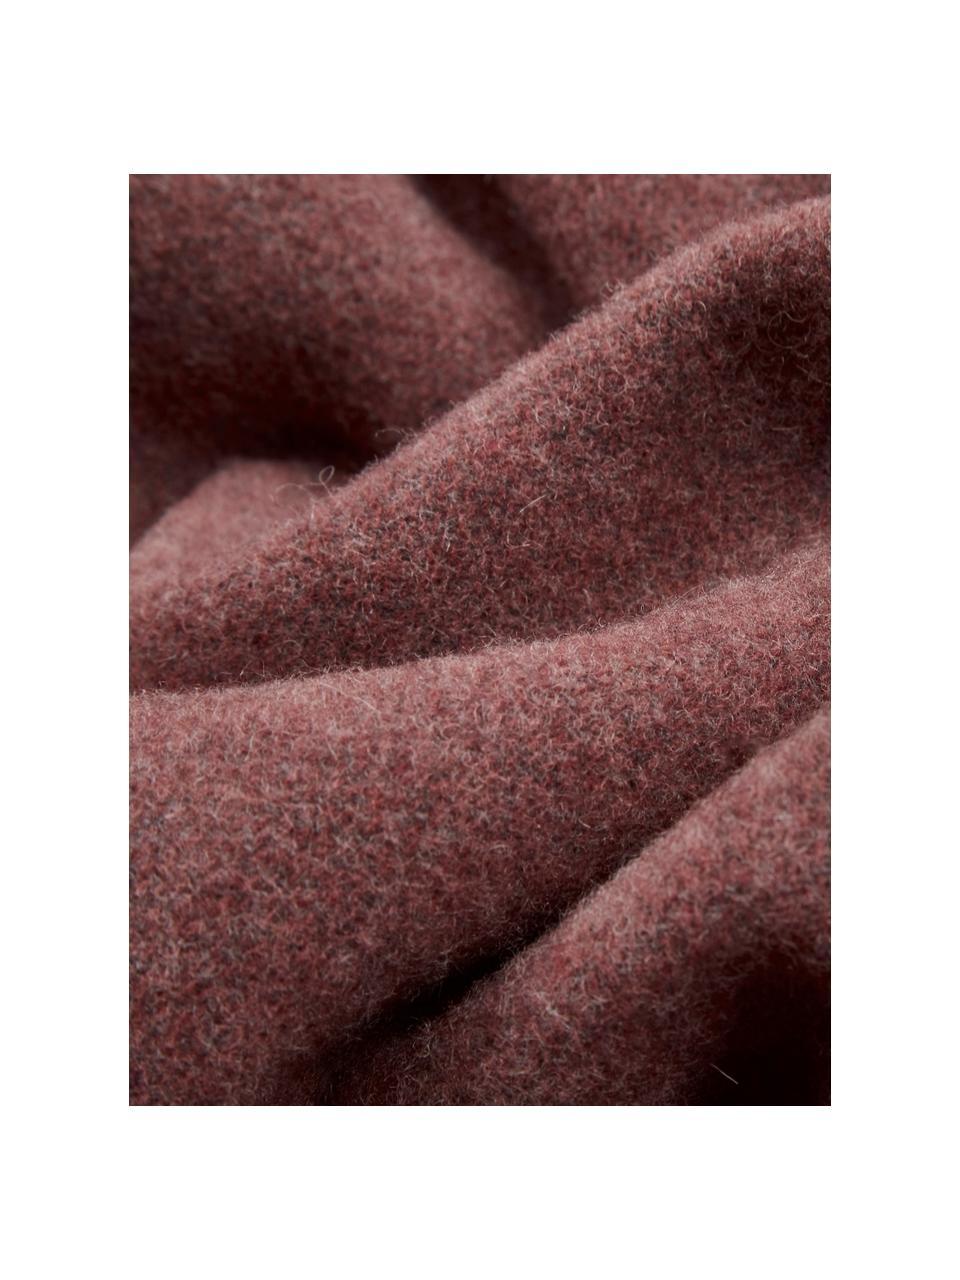 Kaschmirdecke Liliana in Rostrot/Grau, 80%Wolle, 20%Kaschmir, Rosarot, Grau, 130 x 170 cm